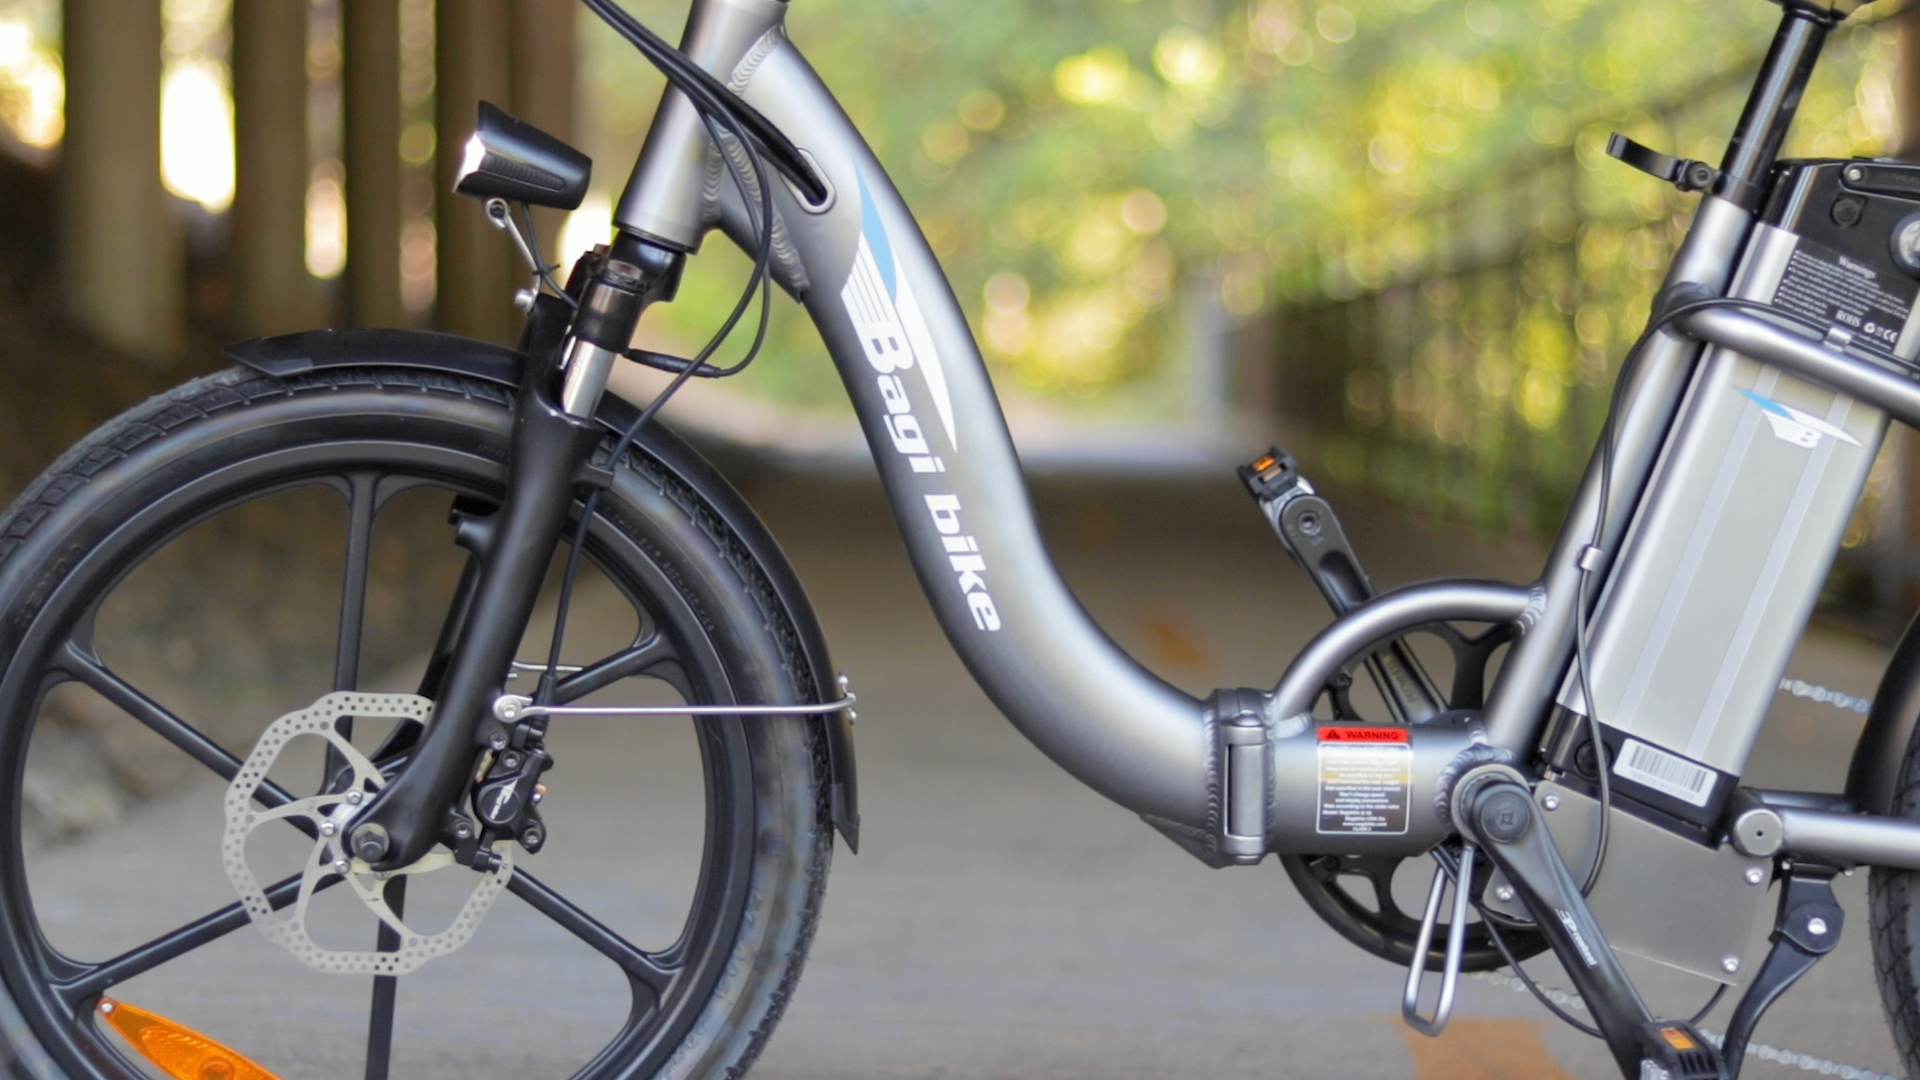 electrified-reviews-bagibike-b10-foldign-electric-bike-review-profile.jpg